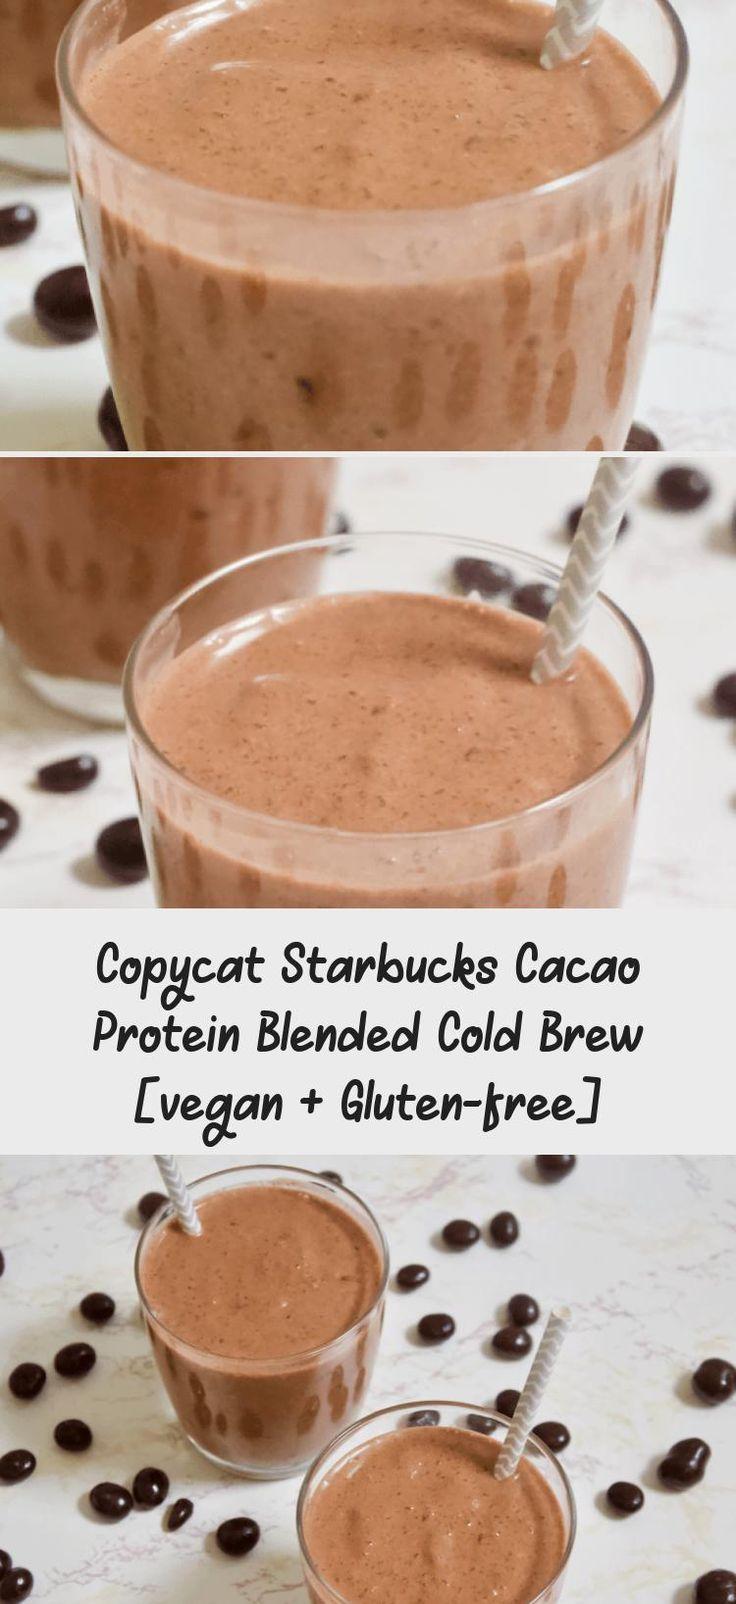 Copycat starbucks cacao protein blended cold brew vegan